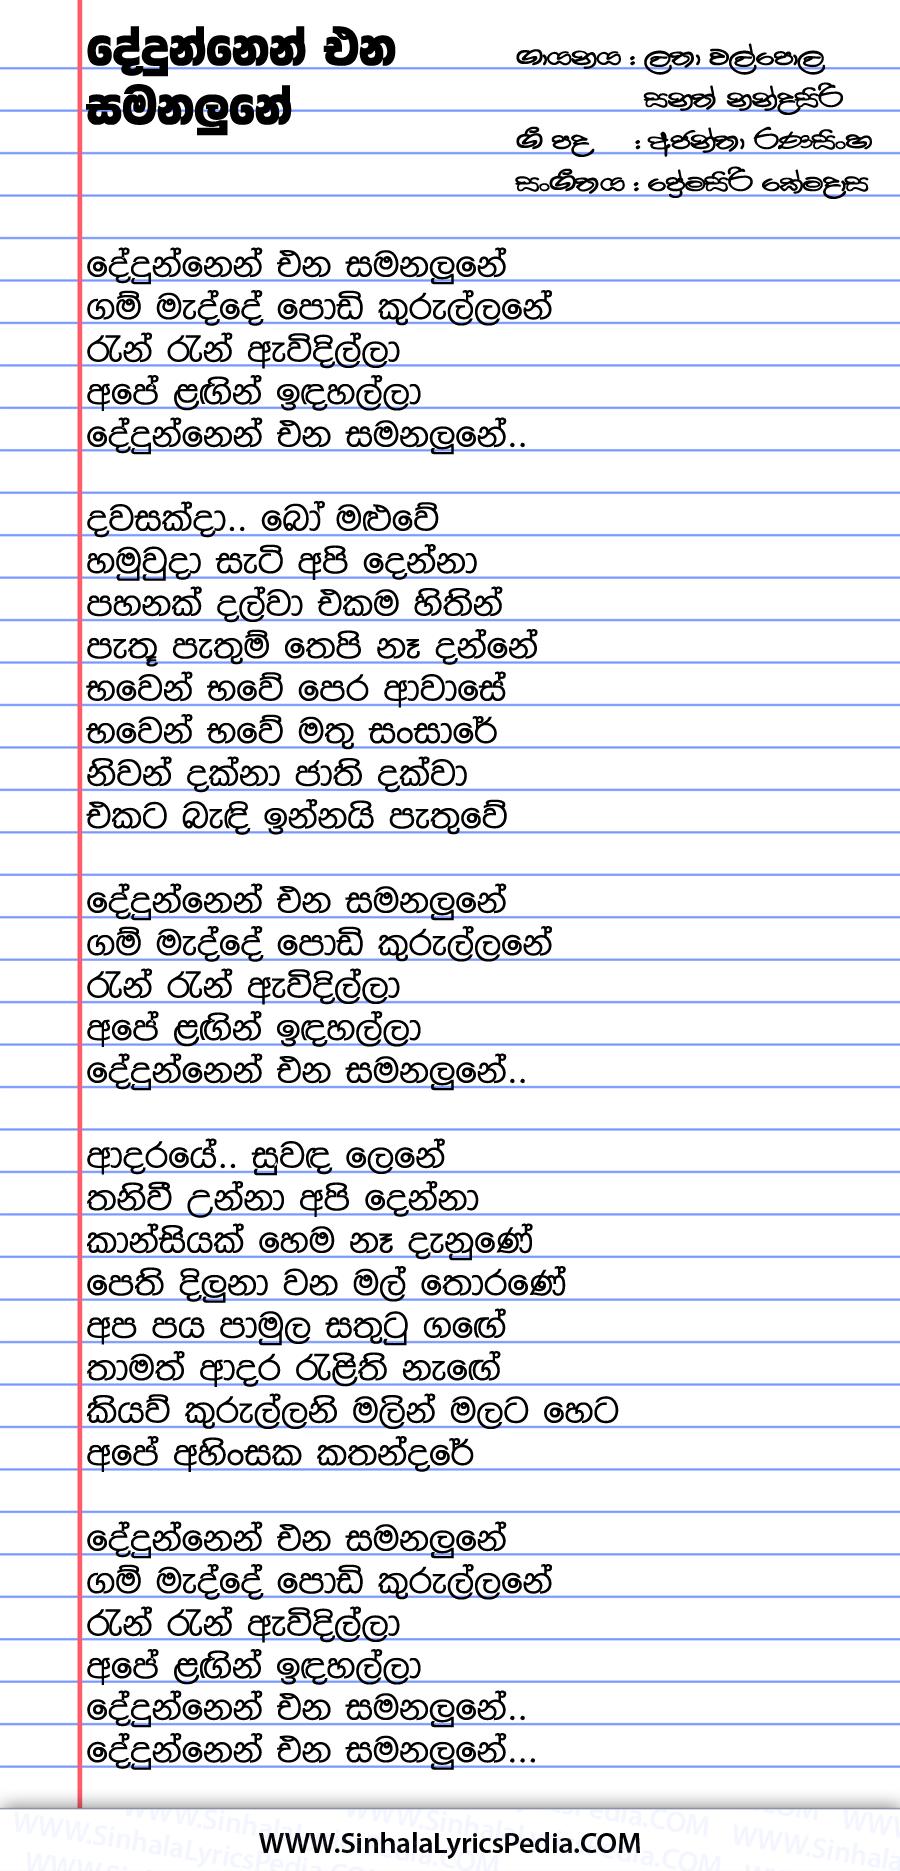 Dedunnen Ena Samanalune Song Lyrics